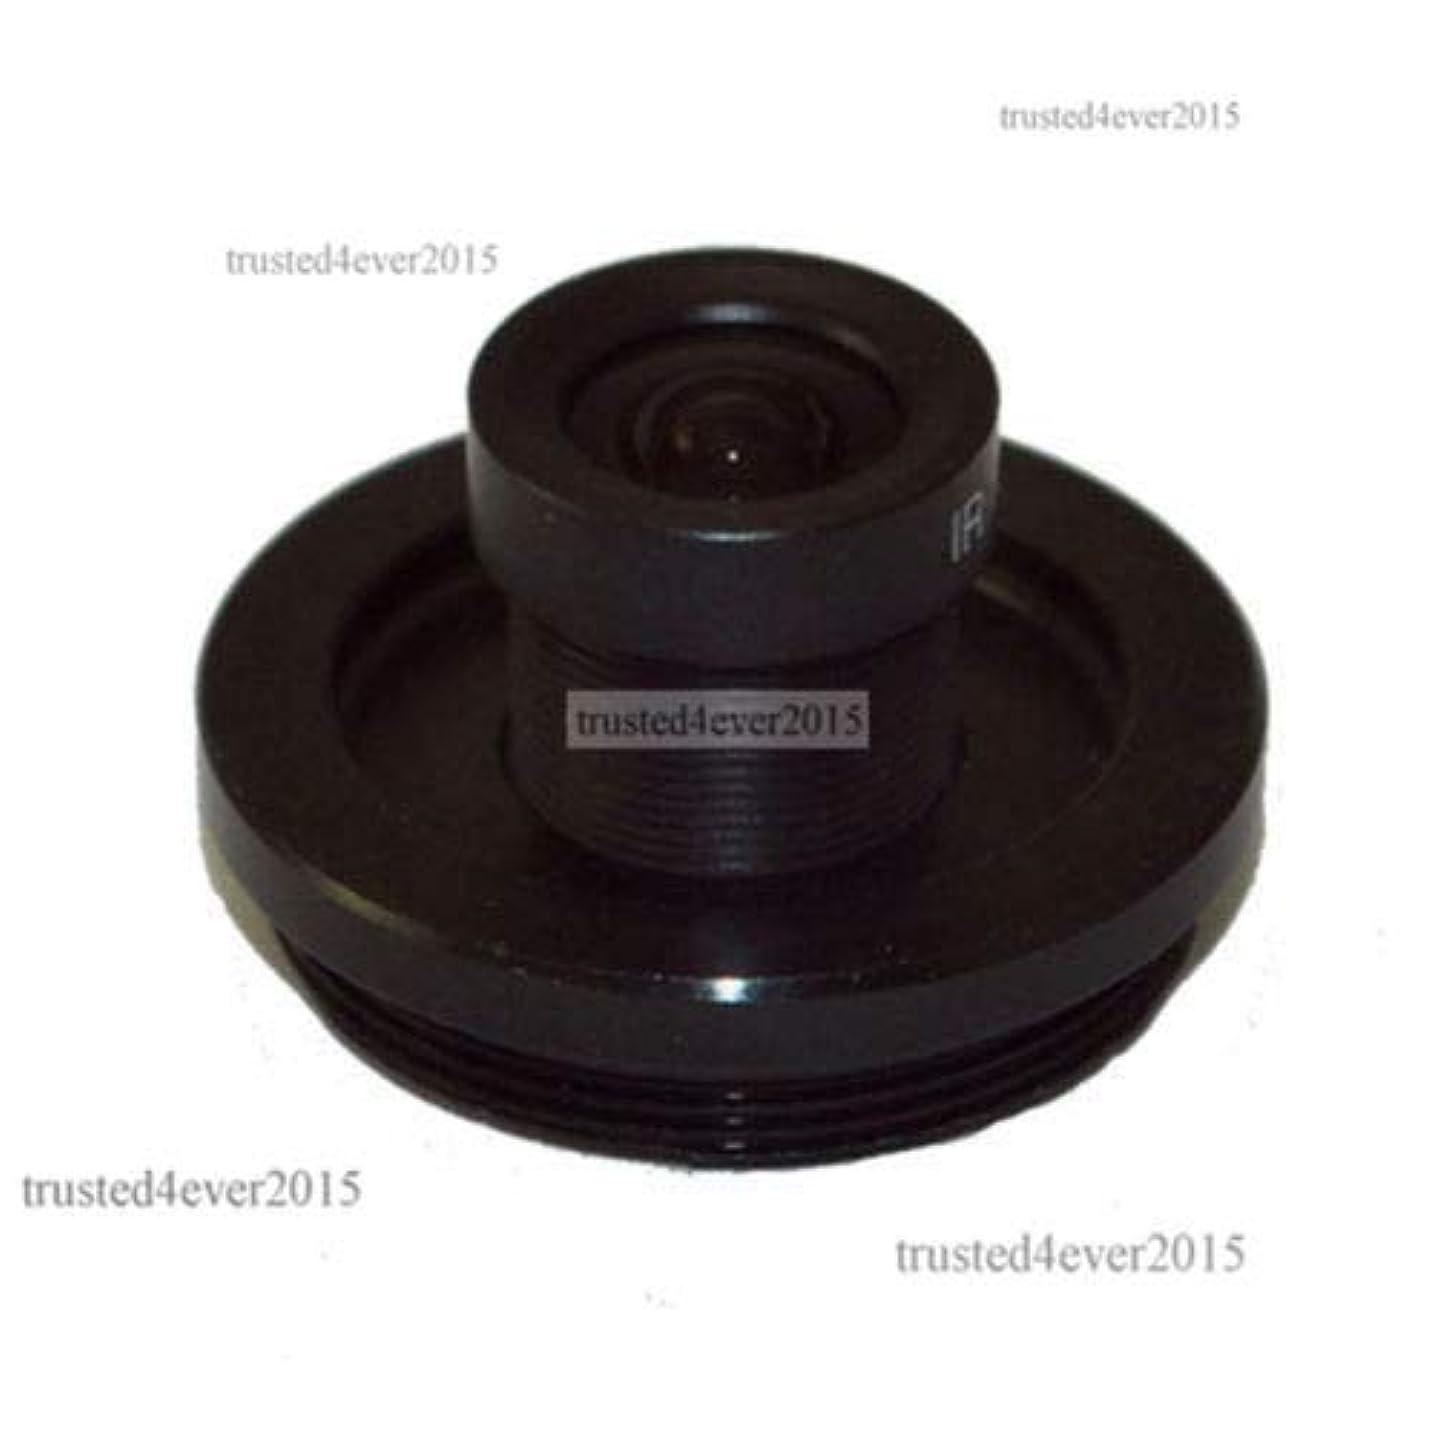 FidgetFidget Lens Converter/Adapter Ring M12 to CS or C Mount Board to CS Mount Connect